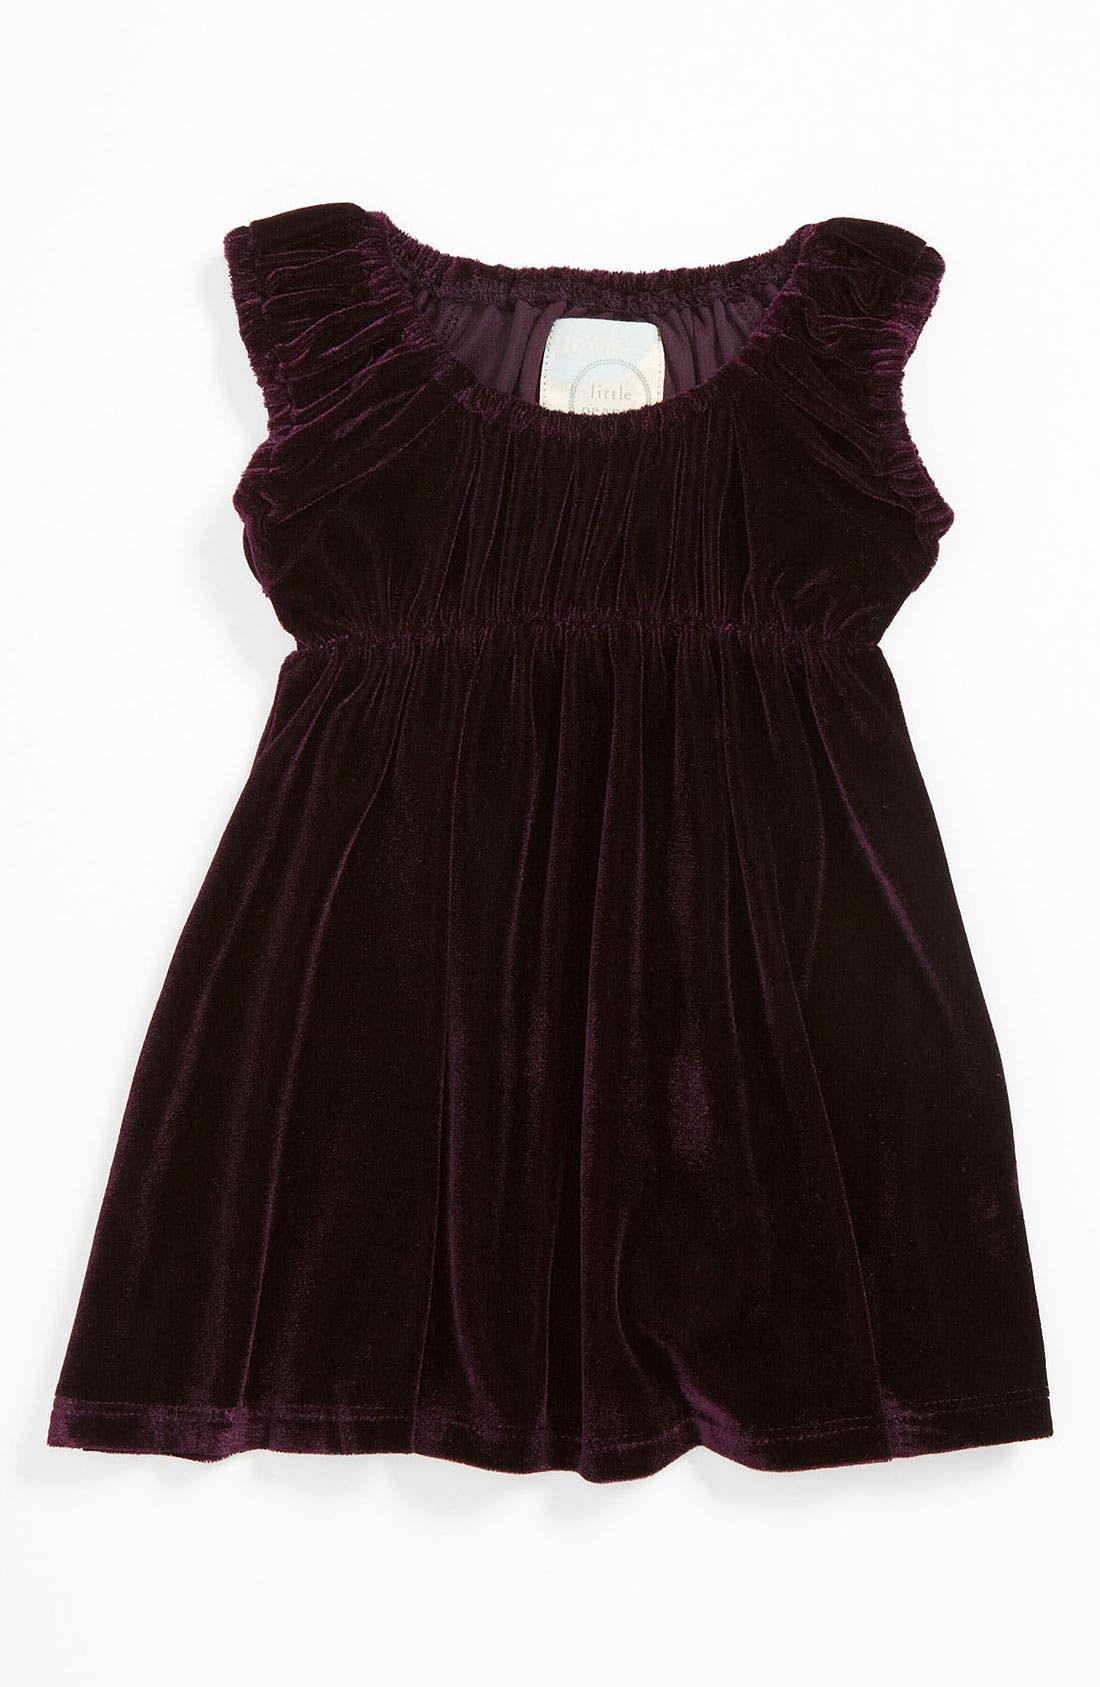 Alternate Image 1 Selected - Peek 'Kate' Dress (Infant)